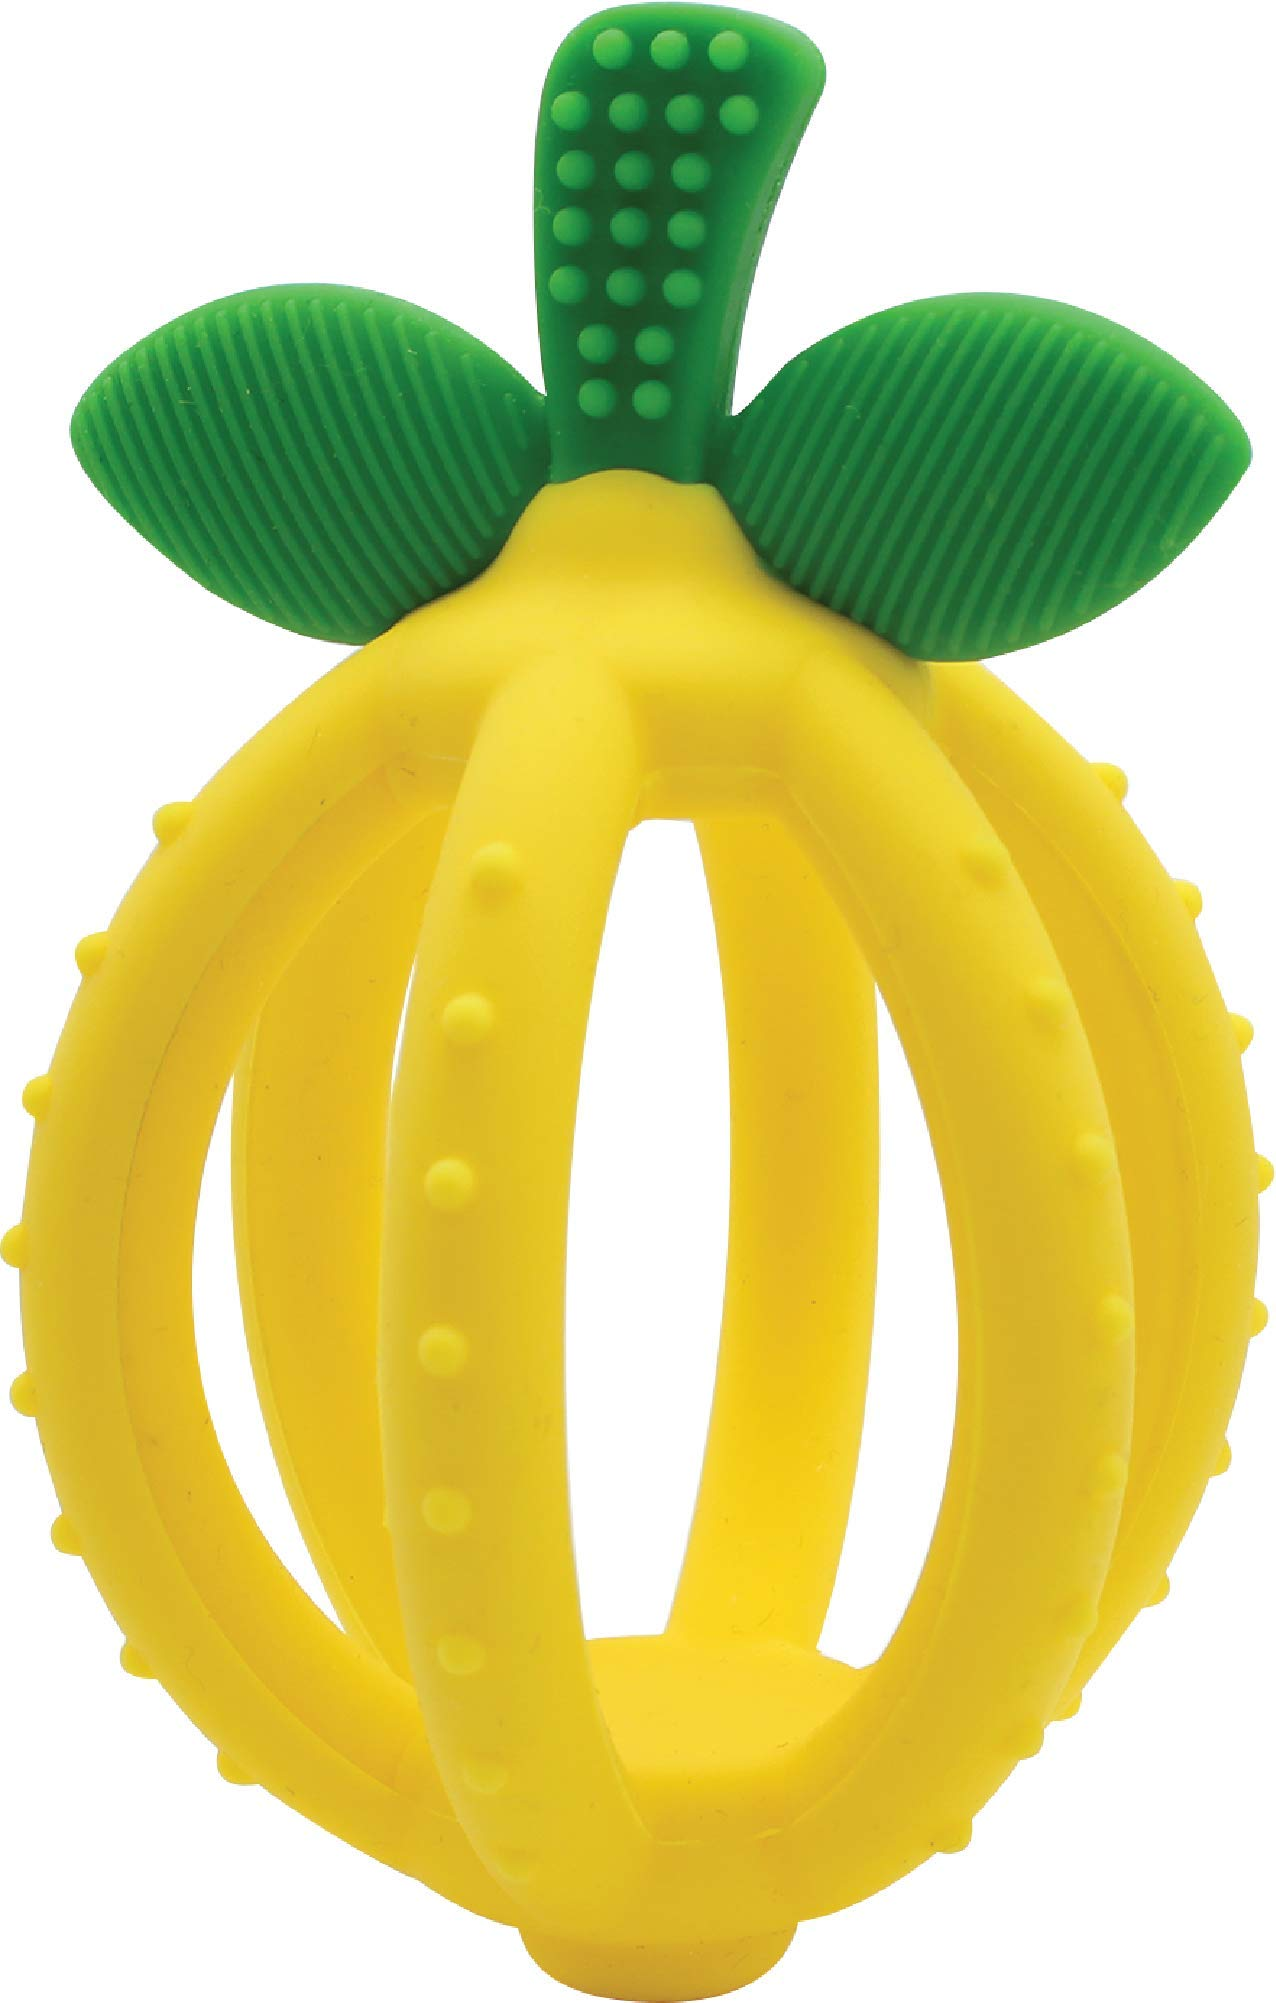 Itzy Ritzy Teething Ball & Training Toothbrush – Silicone, BPA-Free Bitzy Biter Lemon-Shaped Teething Ball Featuring…